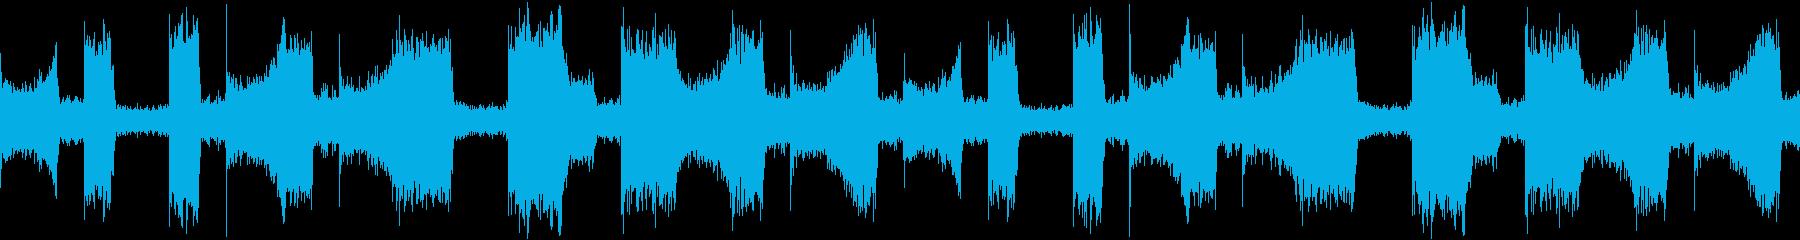 EDM リードシンセ 8 音楽制作用の再生済みの波形